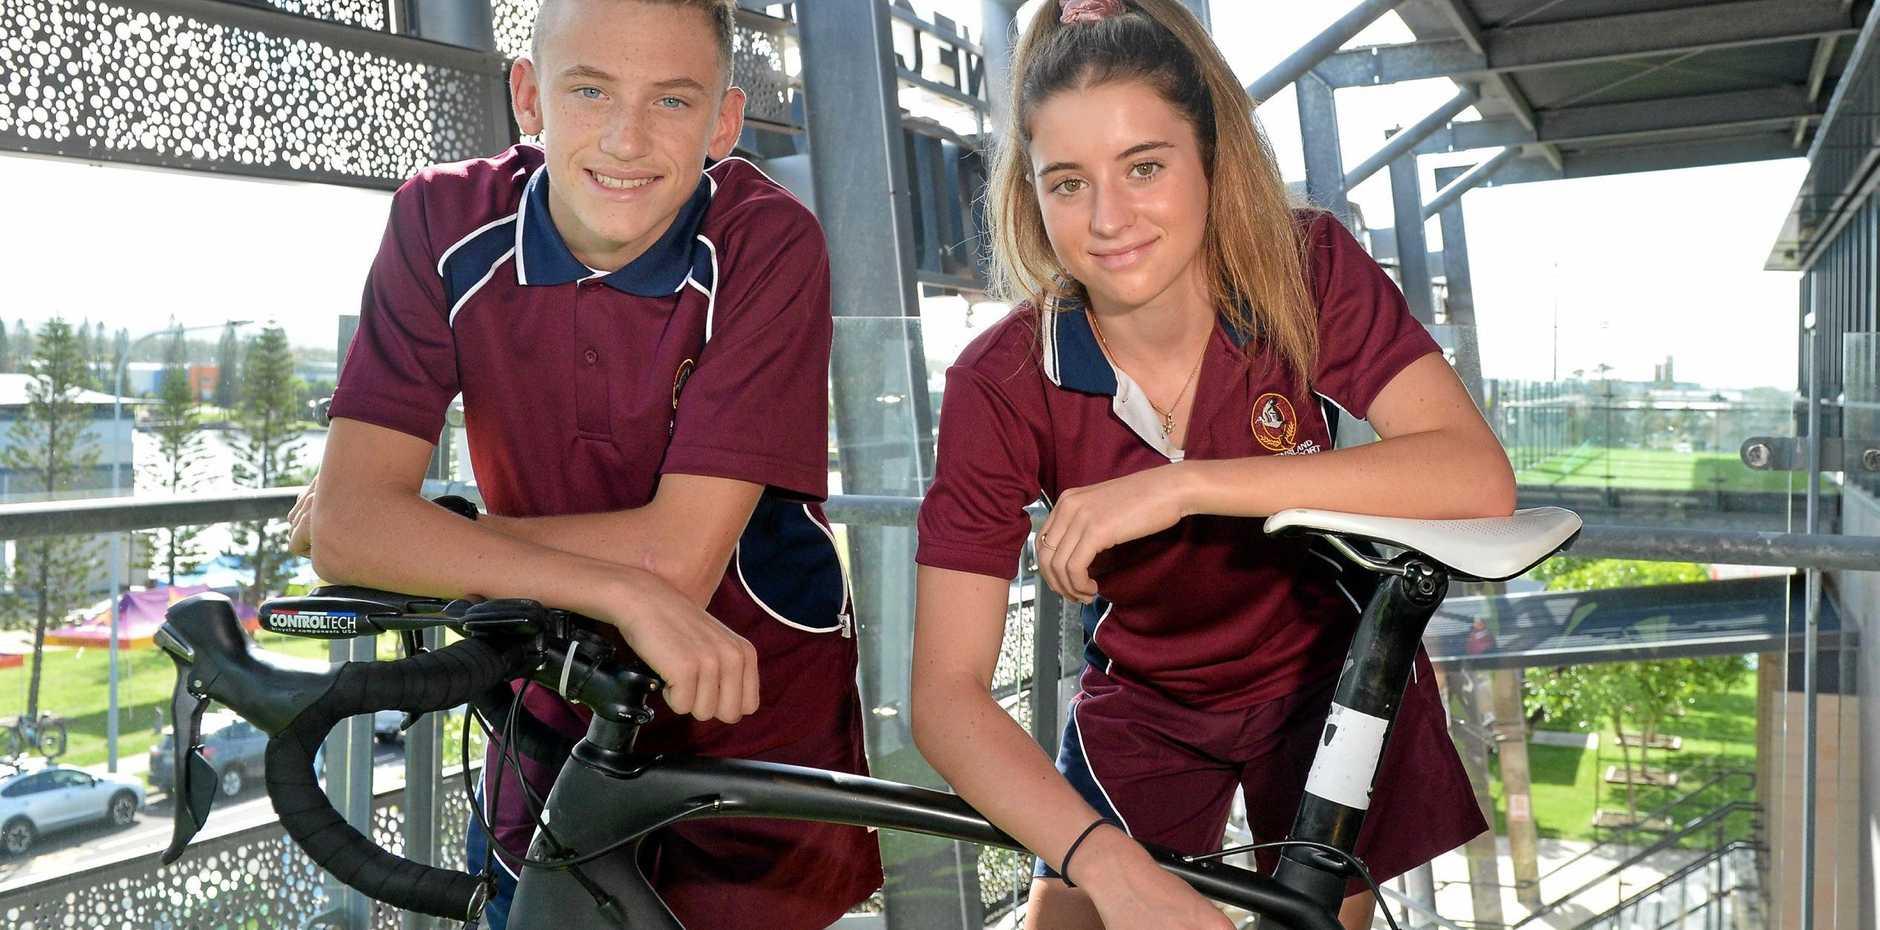 KEEN: Sunshine Coast athletes Peyton Craig and Chloe McLennan are ready for the School Sport National Triathlon Championships at Lake Kawana this weekend.